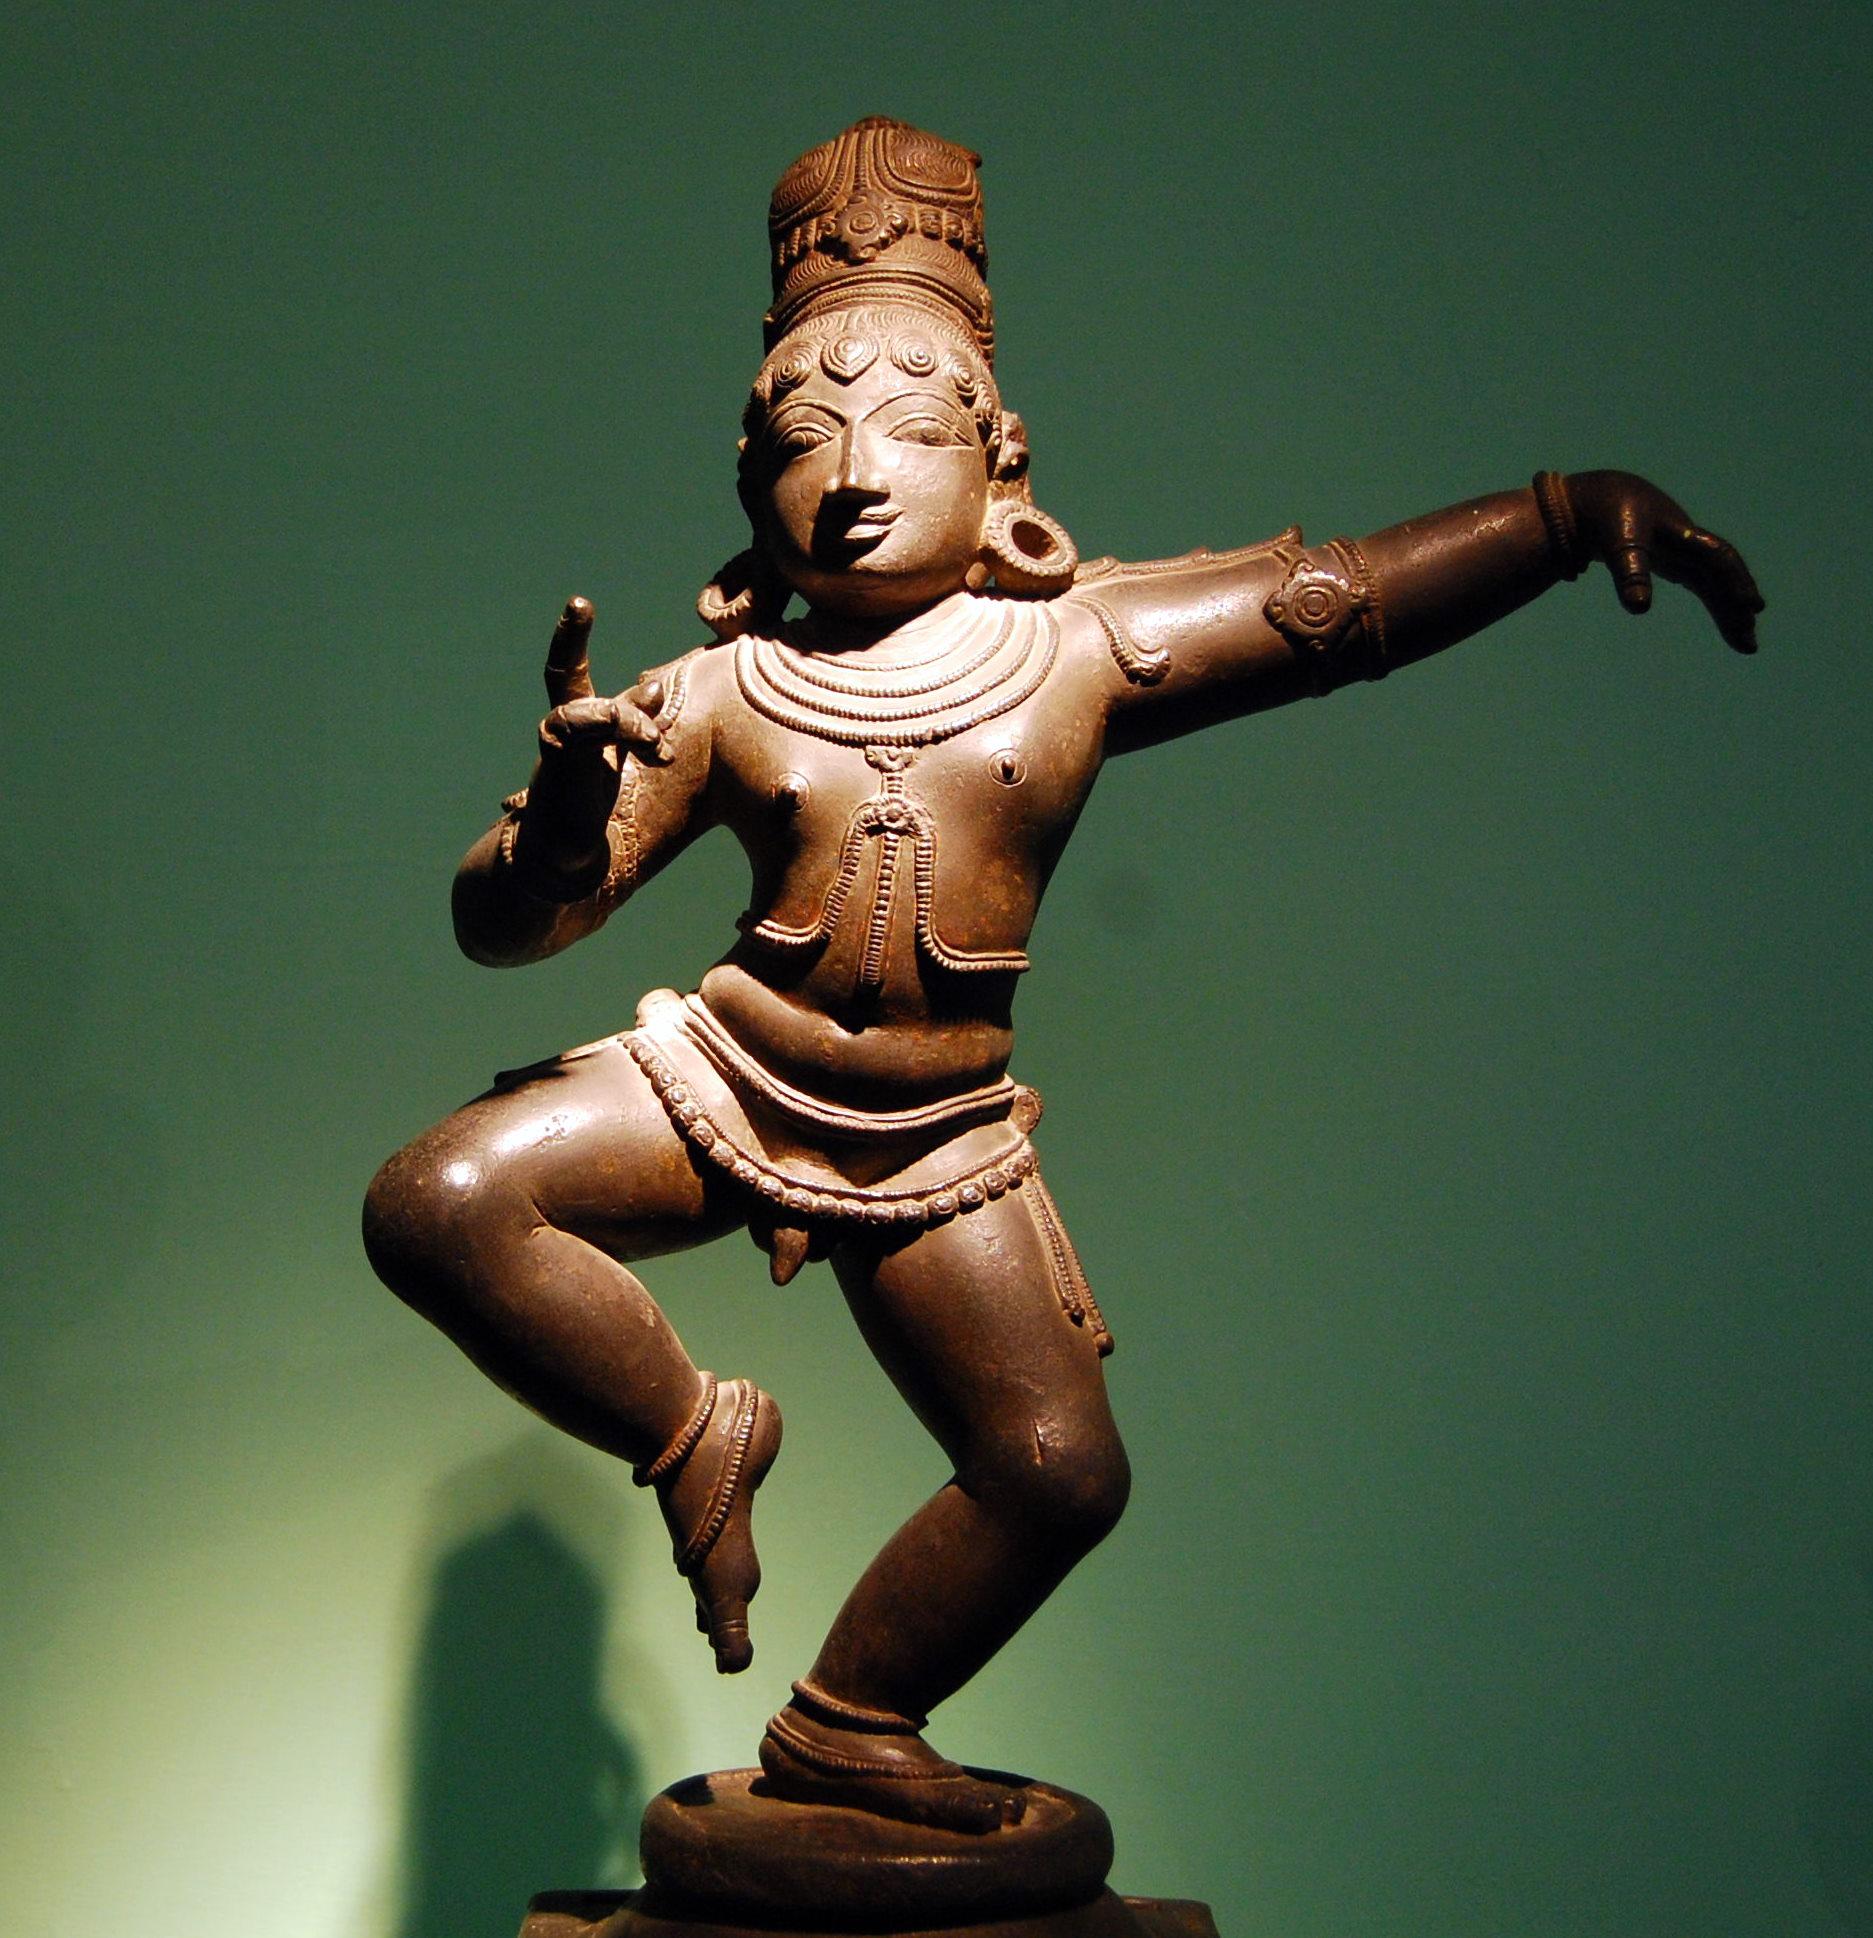 https://upload.wikimedia.org/wikipedia/commons/a/a3/Balakrishna_at_National_Museum%2C_New_Delhi.jpg